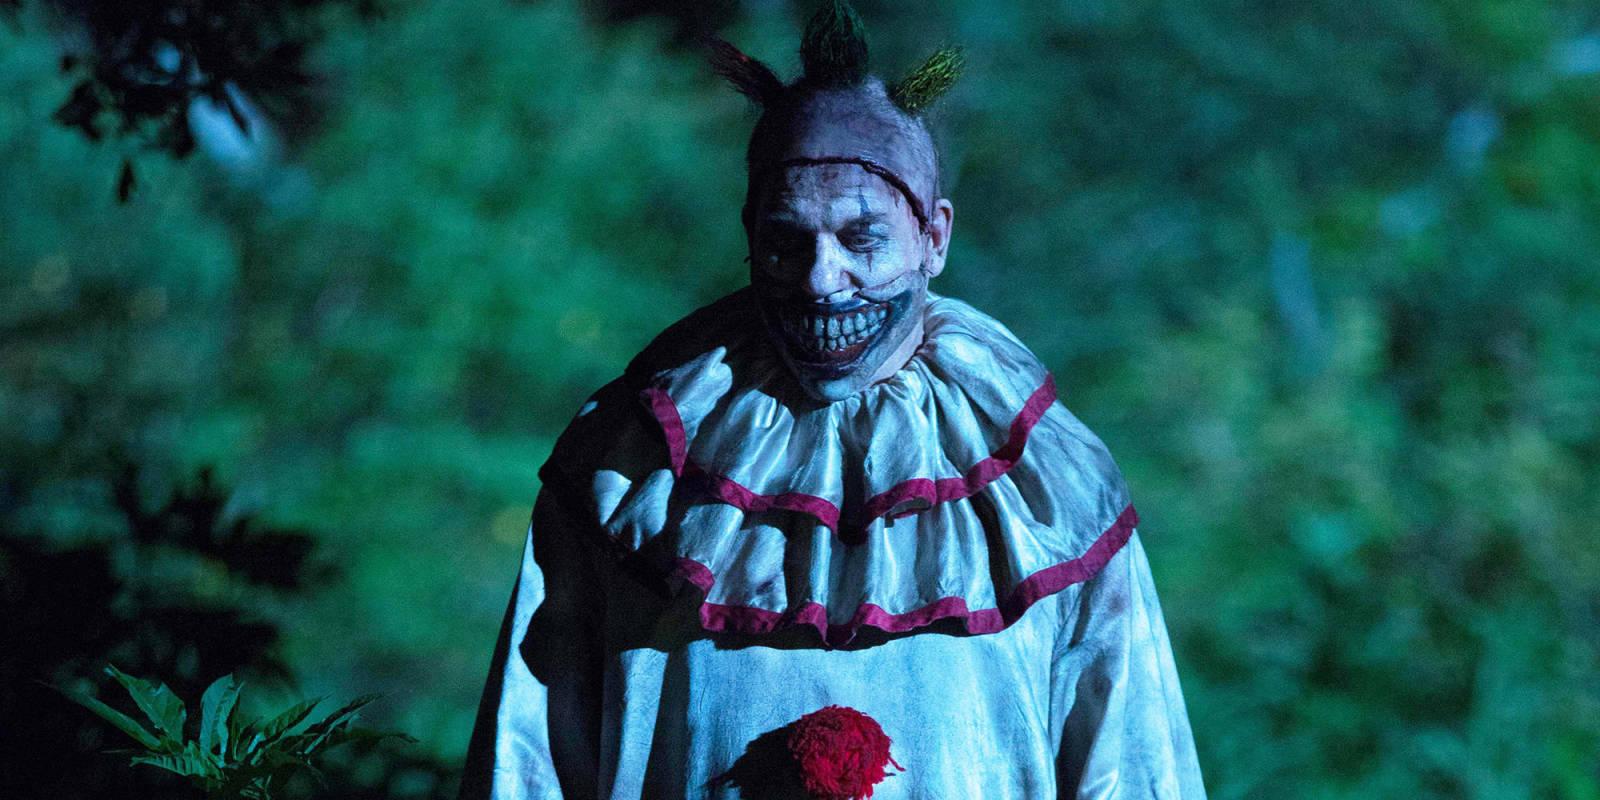 Q Amp A John Carroll Lynch On Playing The Twisty The Clown On